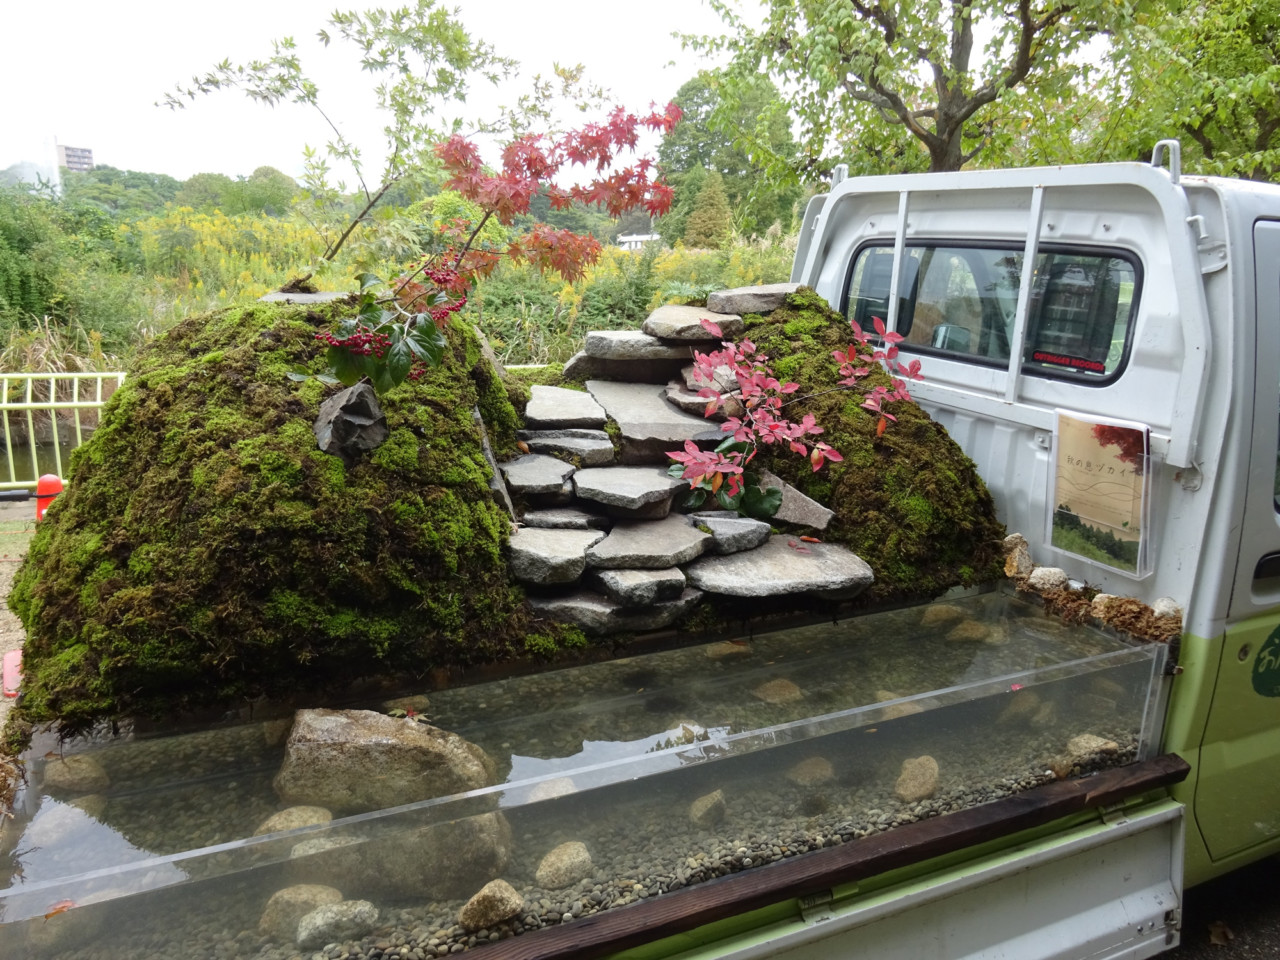 truck-garden-5-640x480@2x